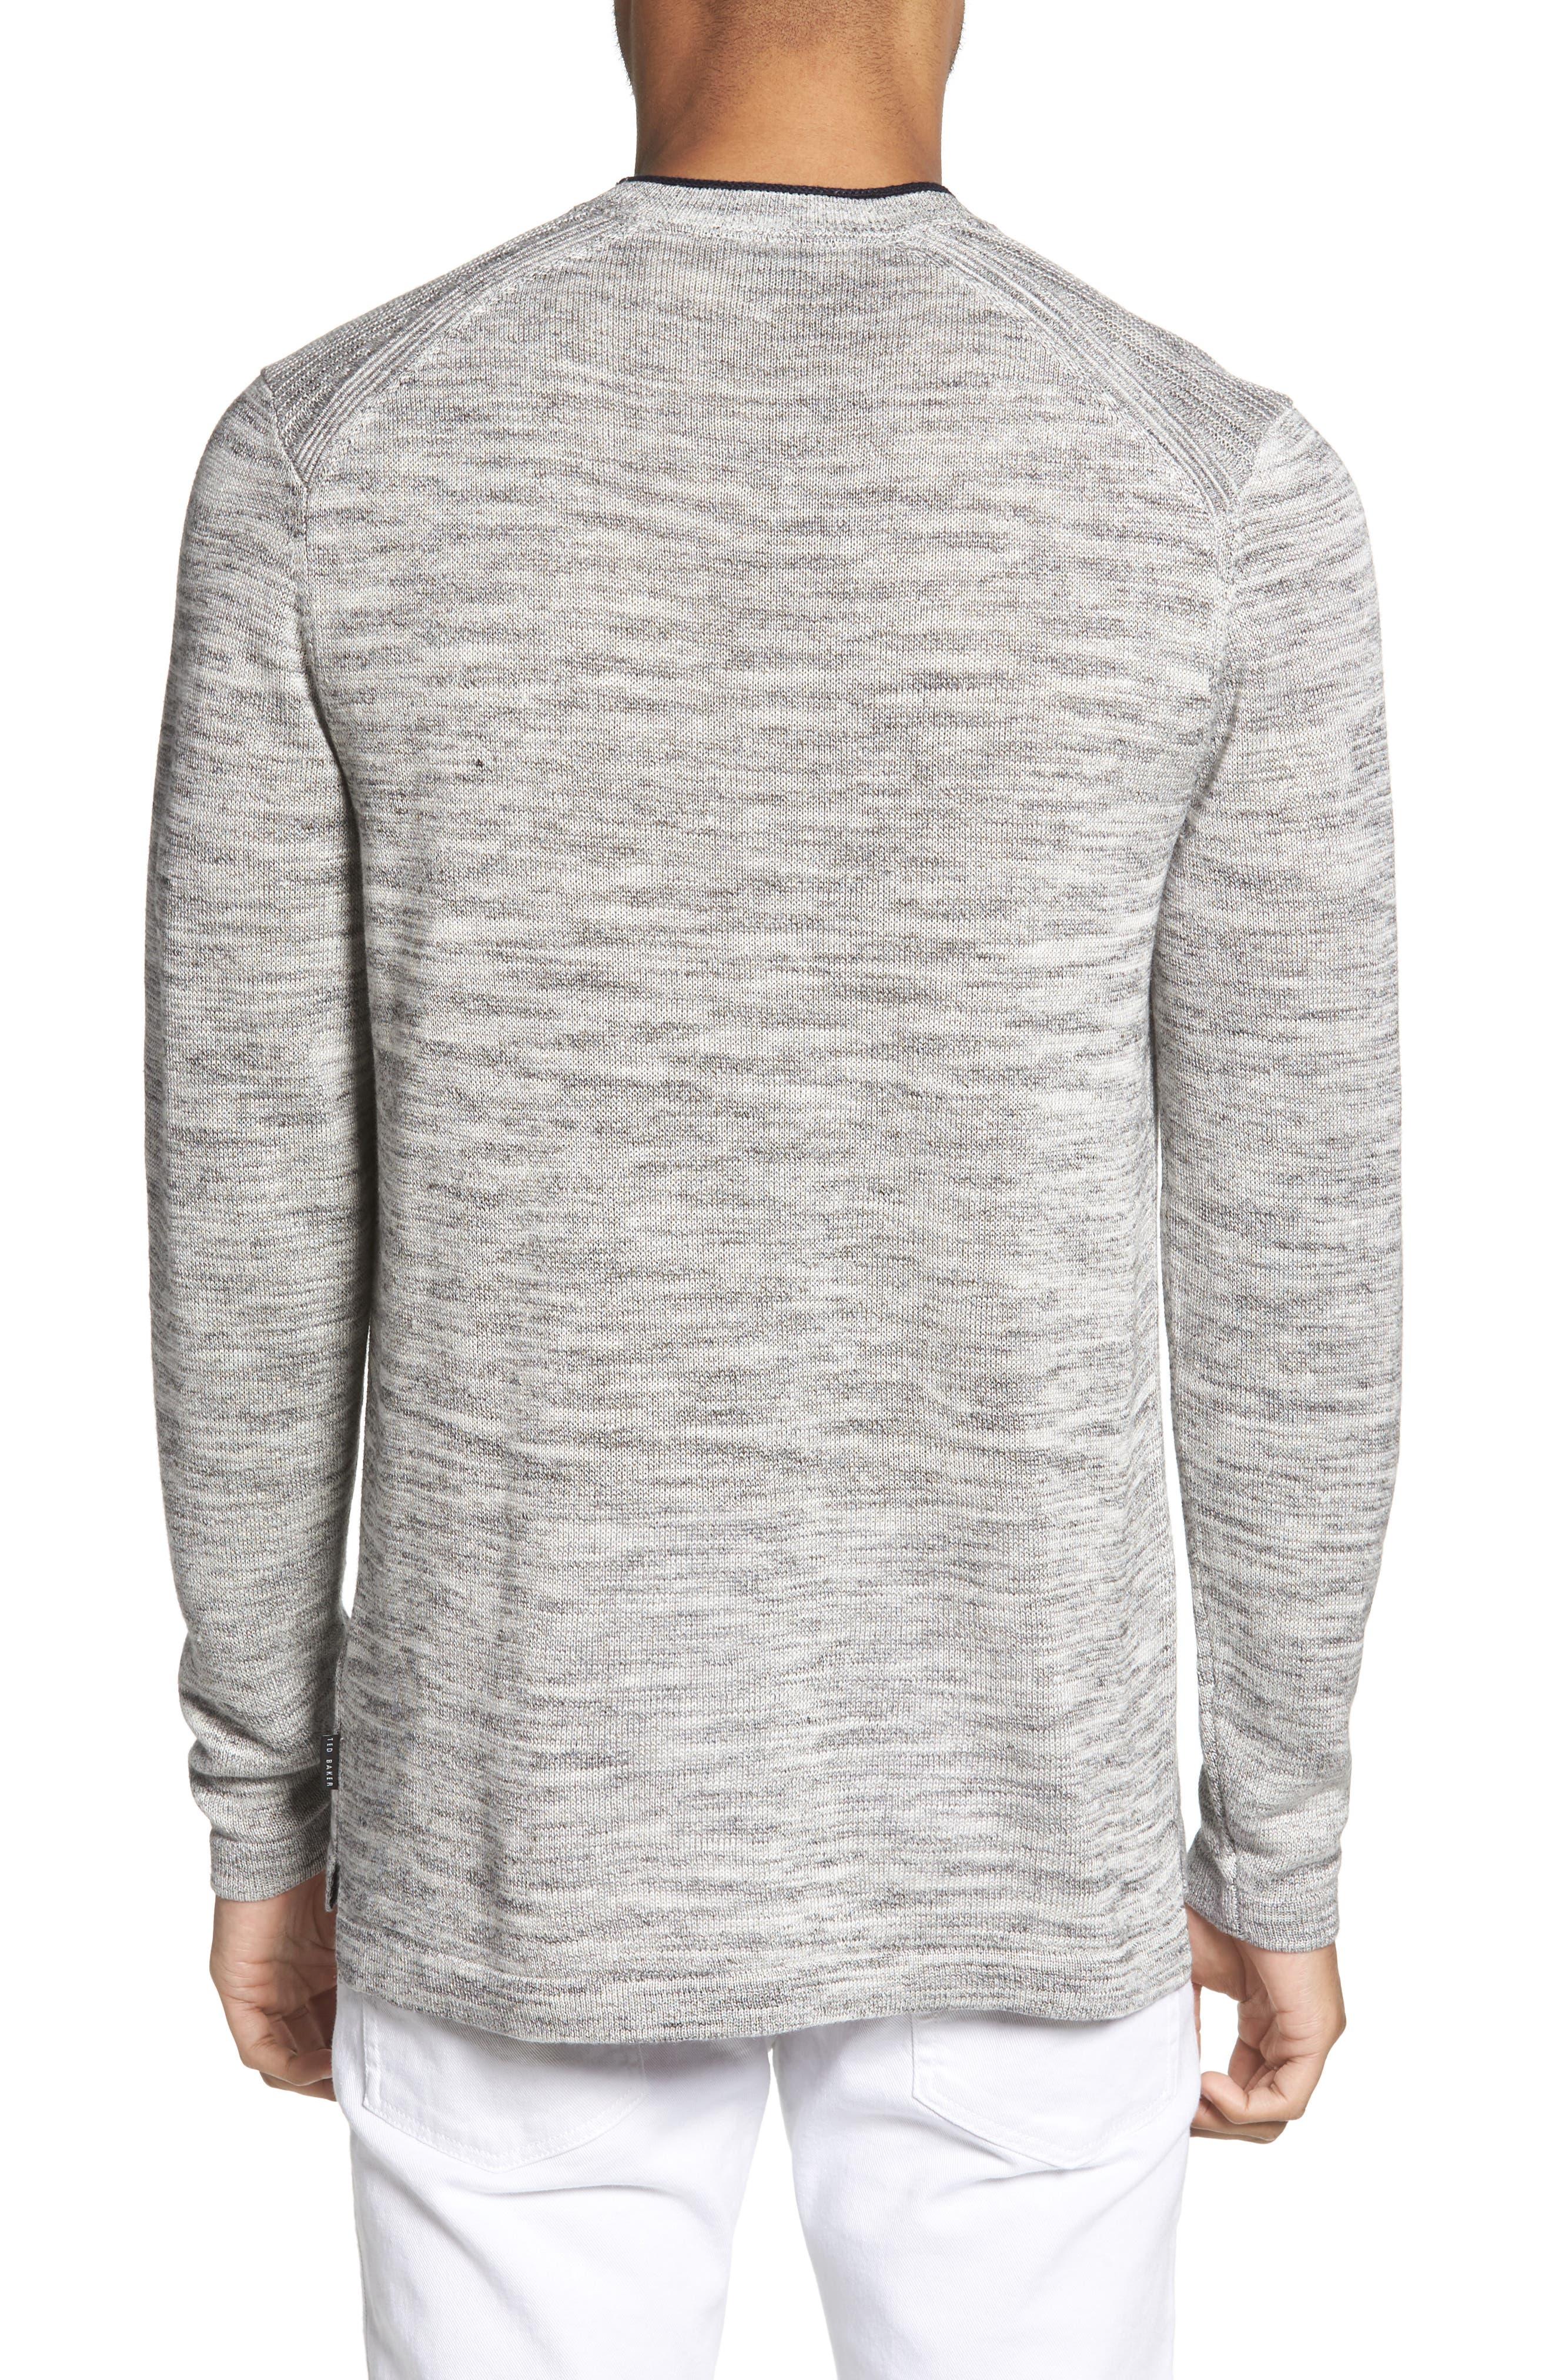 Inzone Crewneck Linen Blend Sweater,                             Alternate thumbnail 2, color,                             050